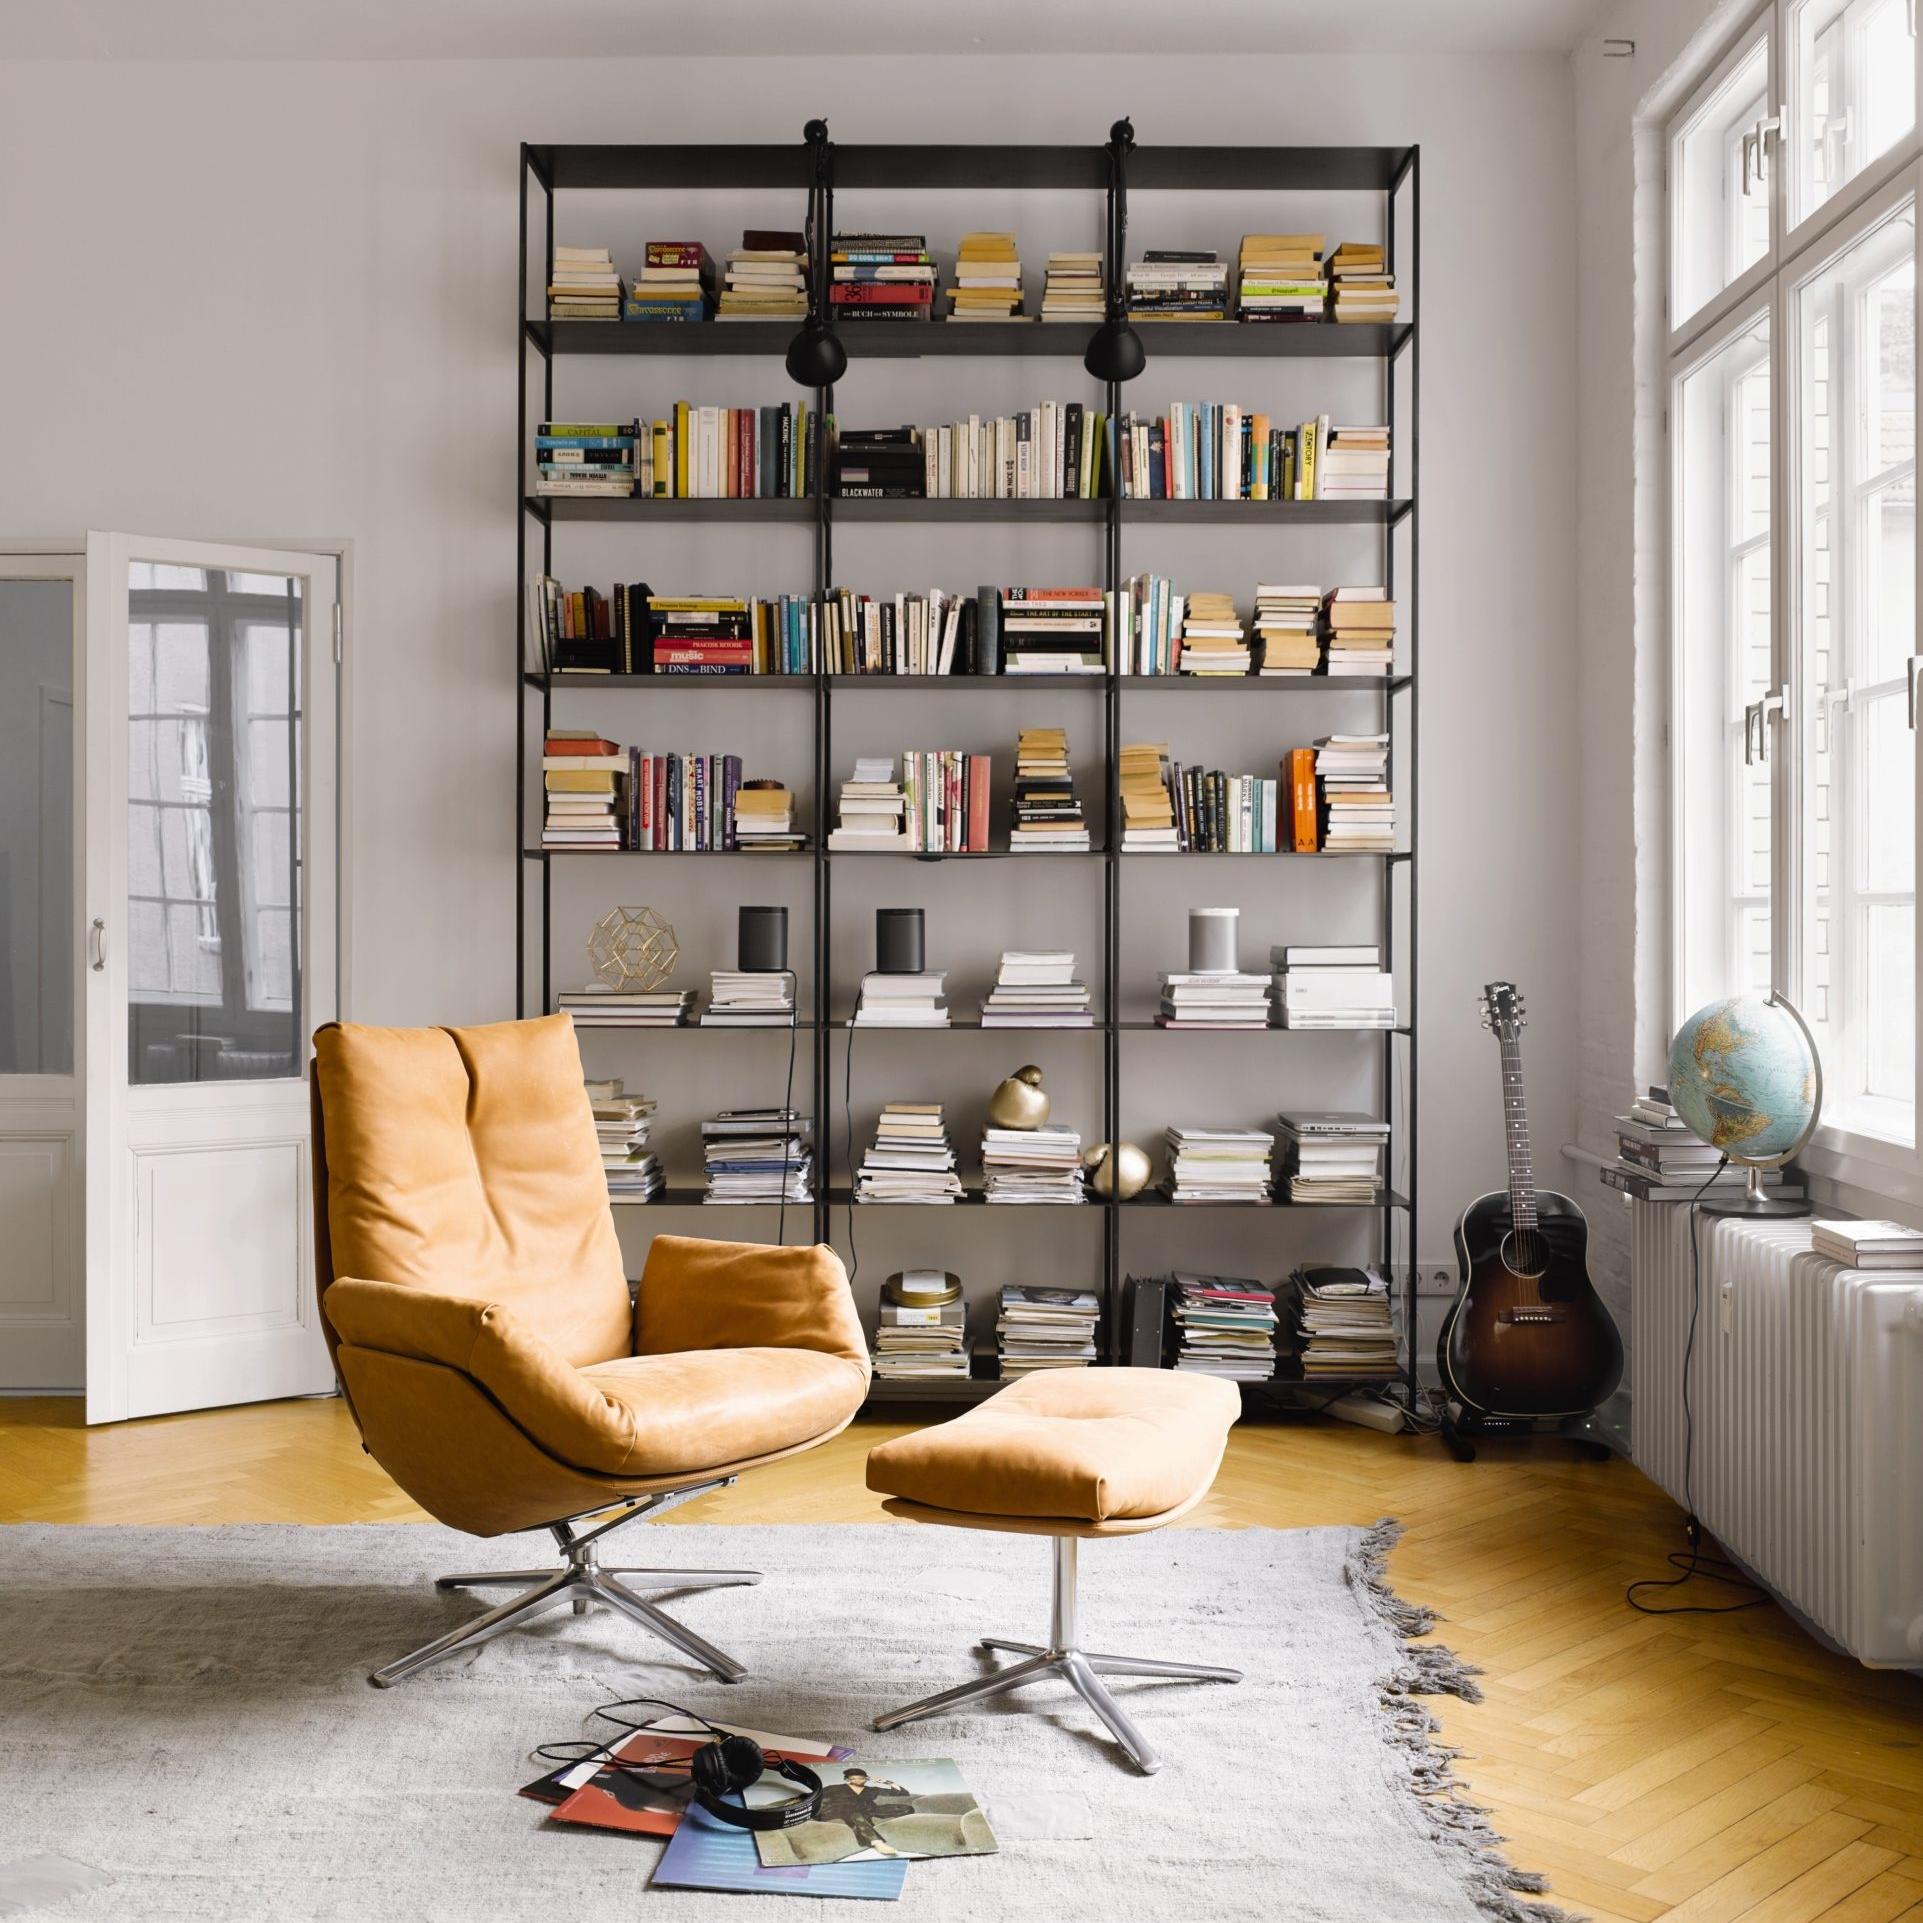 COR Cordia Lounge Sessel Ingolstadt